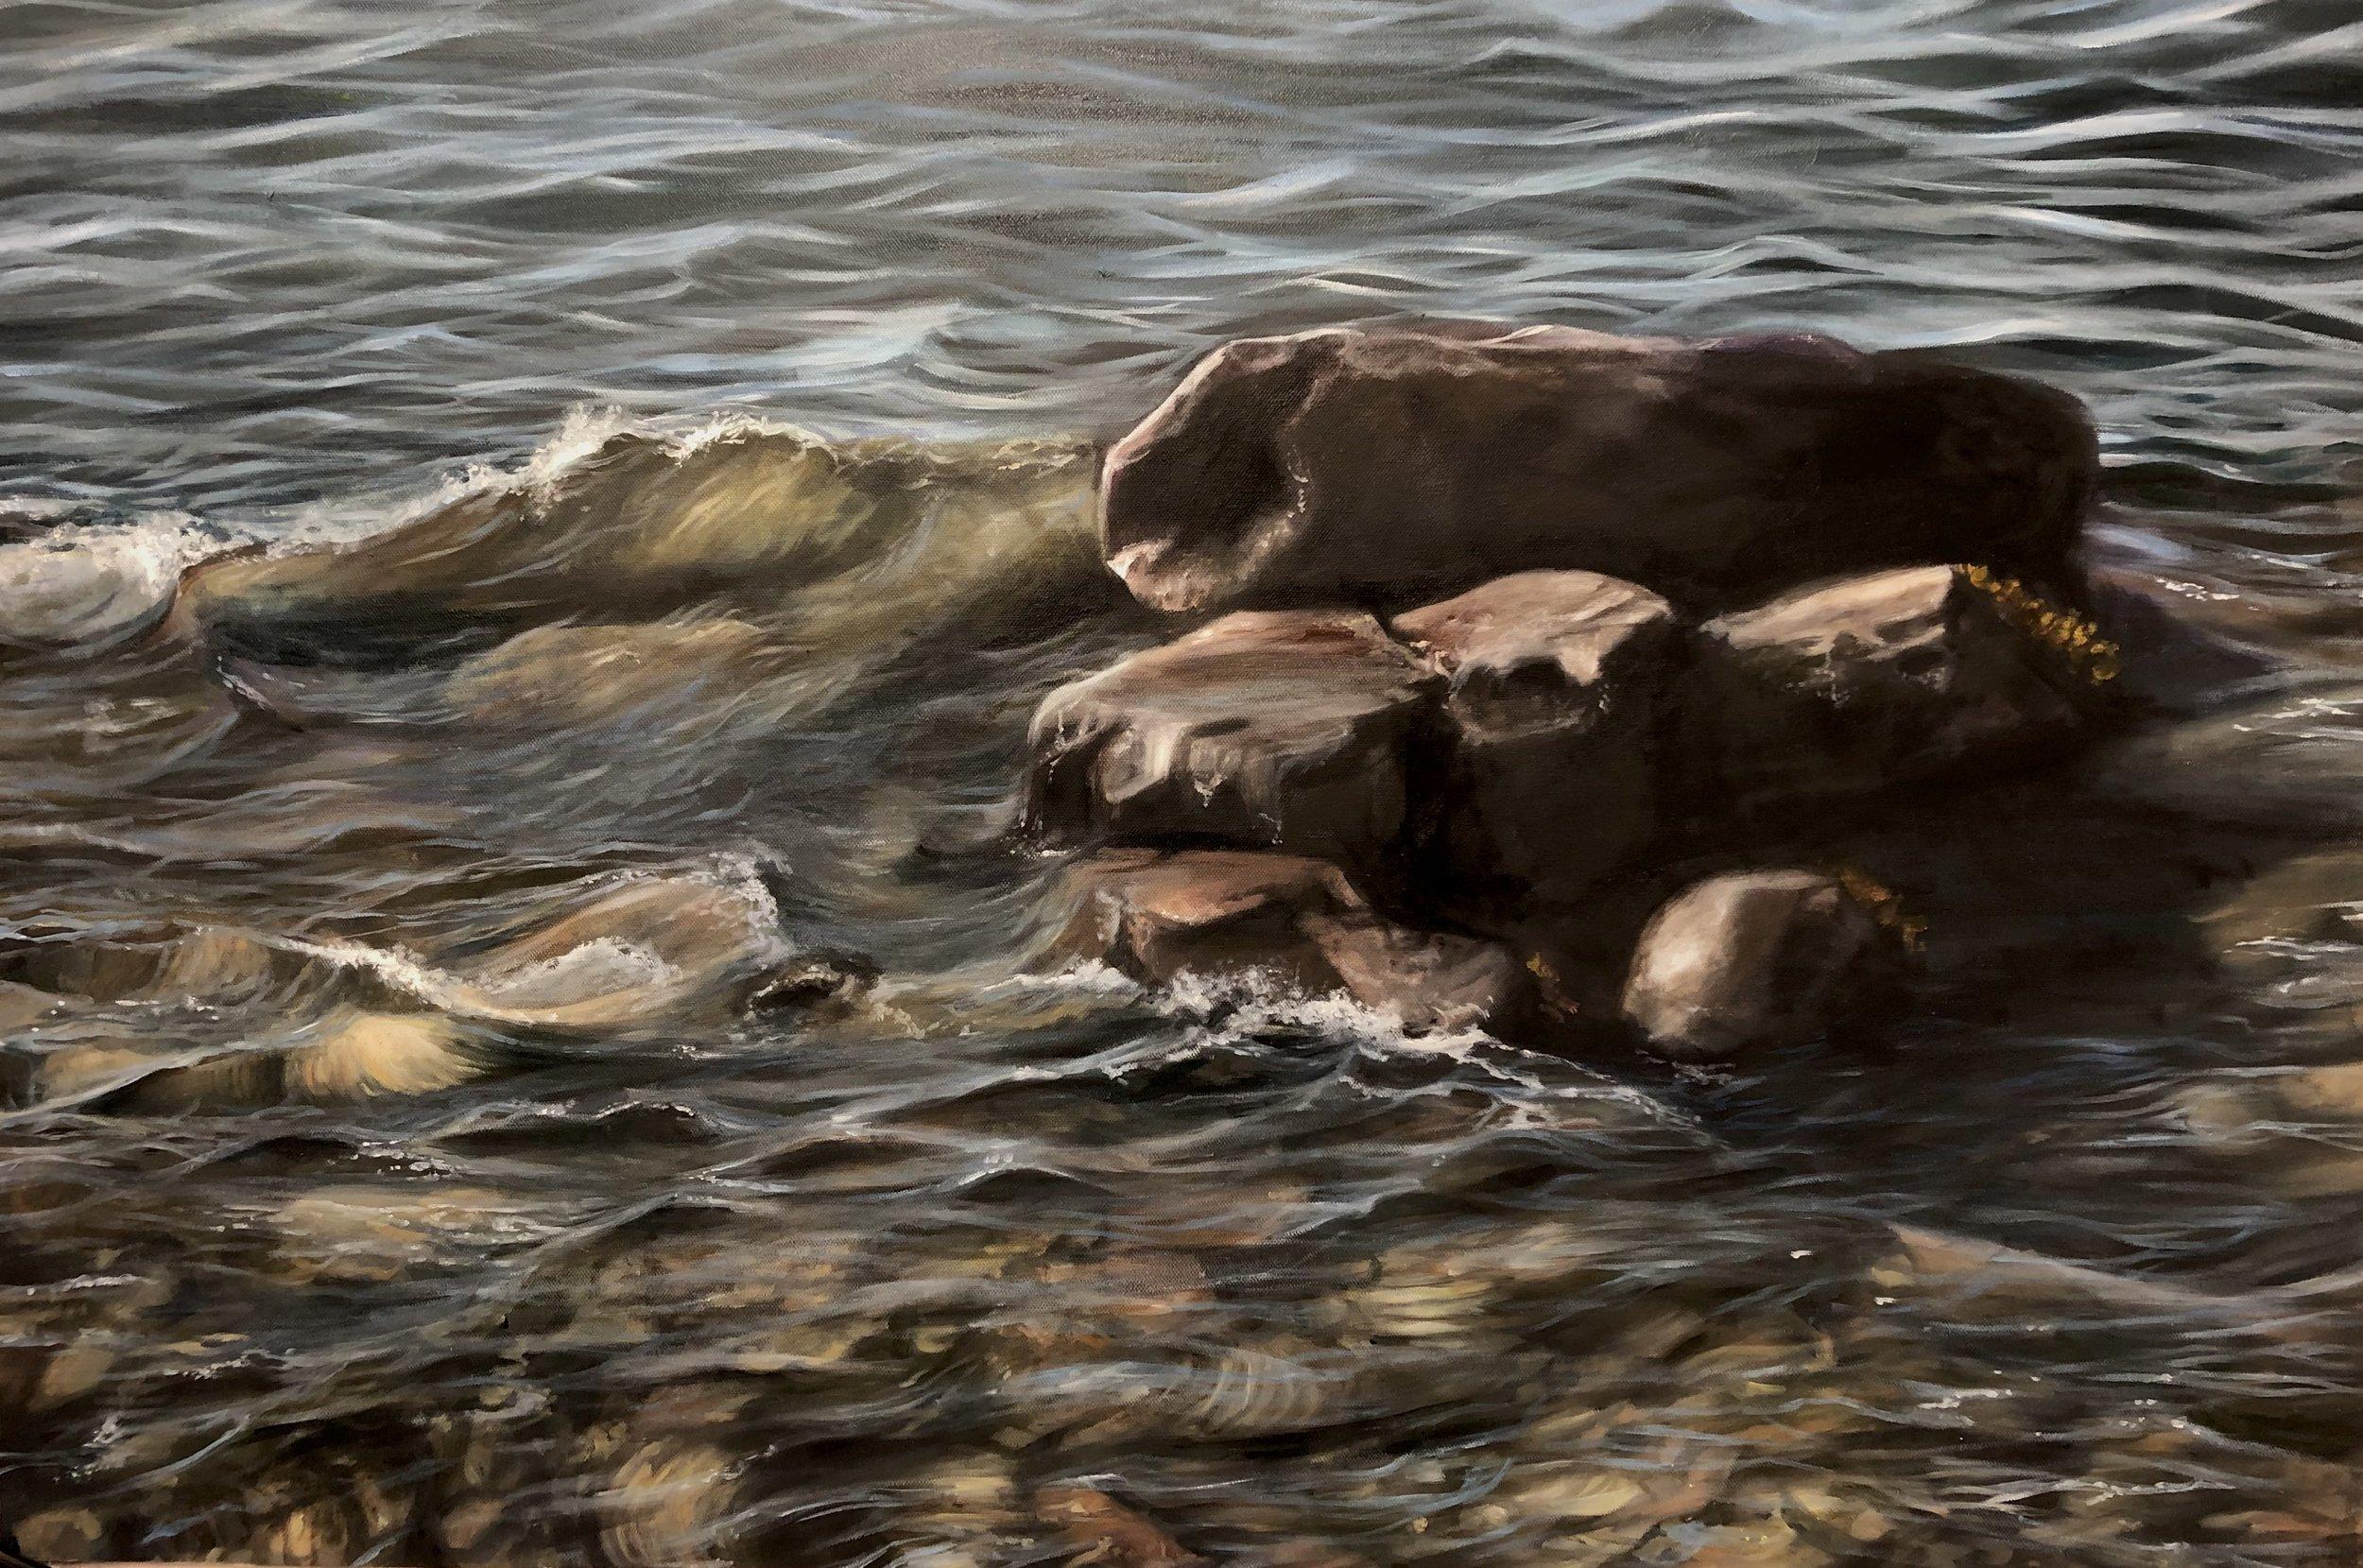 Conversion, Oil on Canvas, 2019